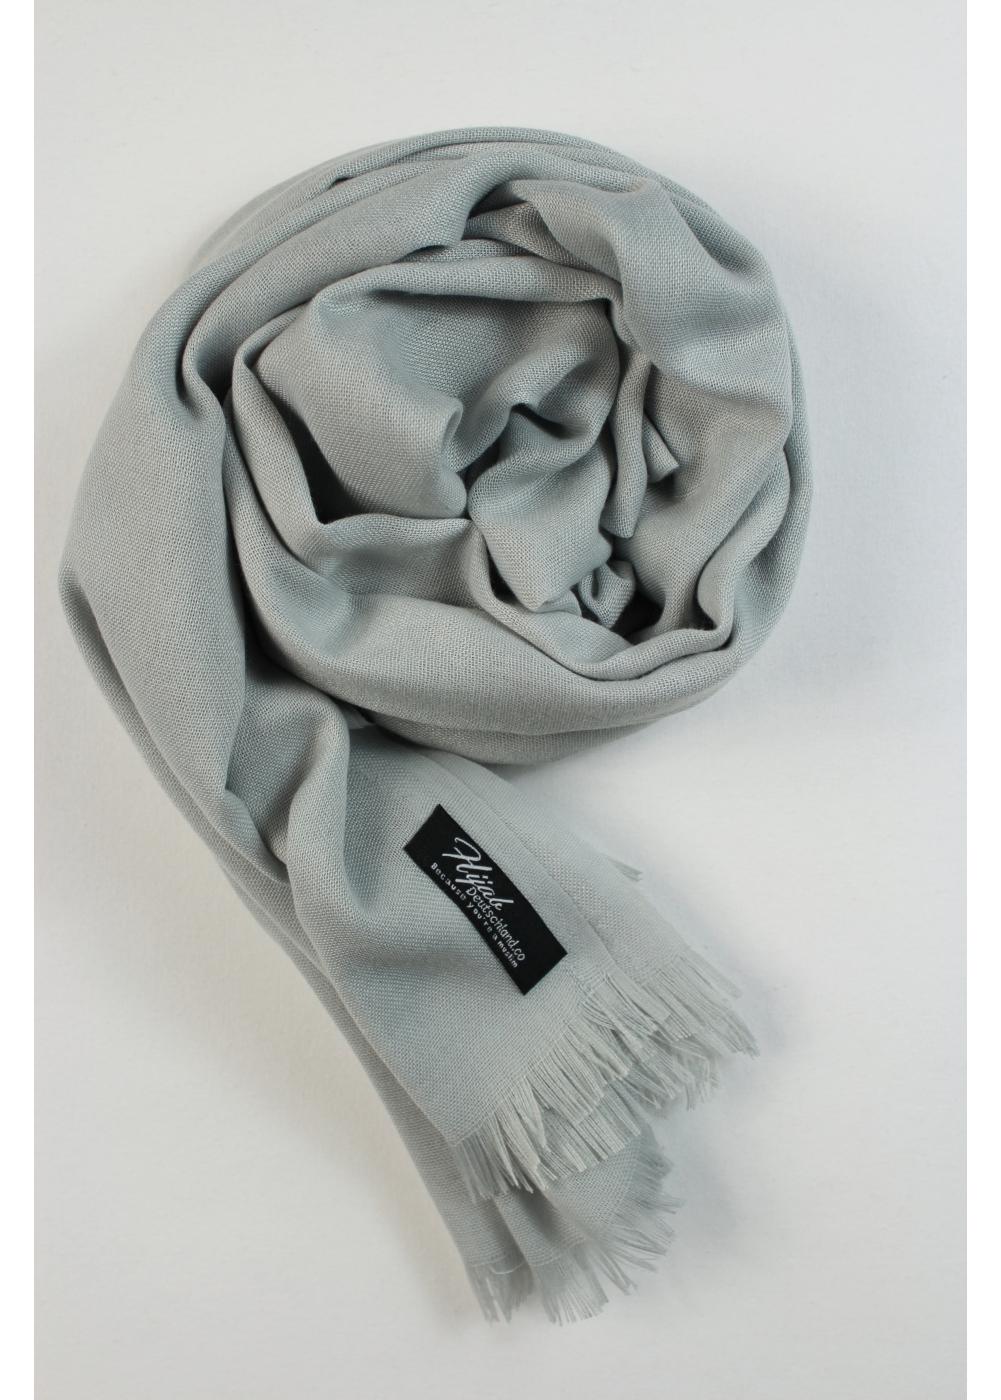 Pashmina hijab french grey